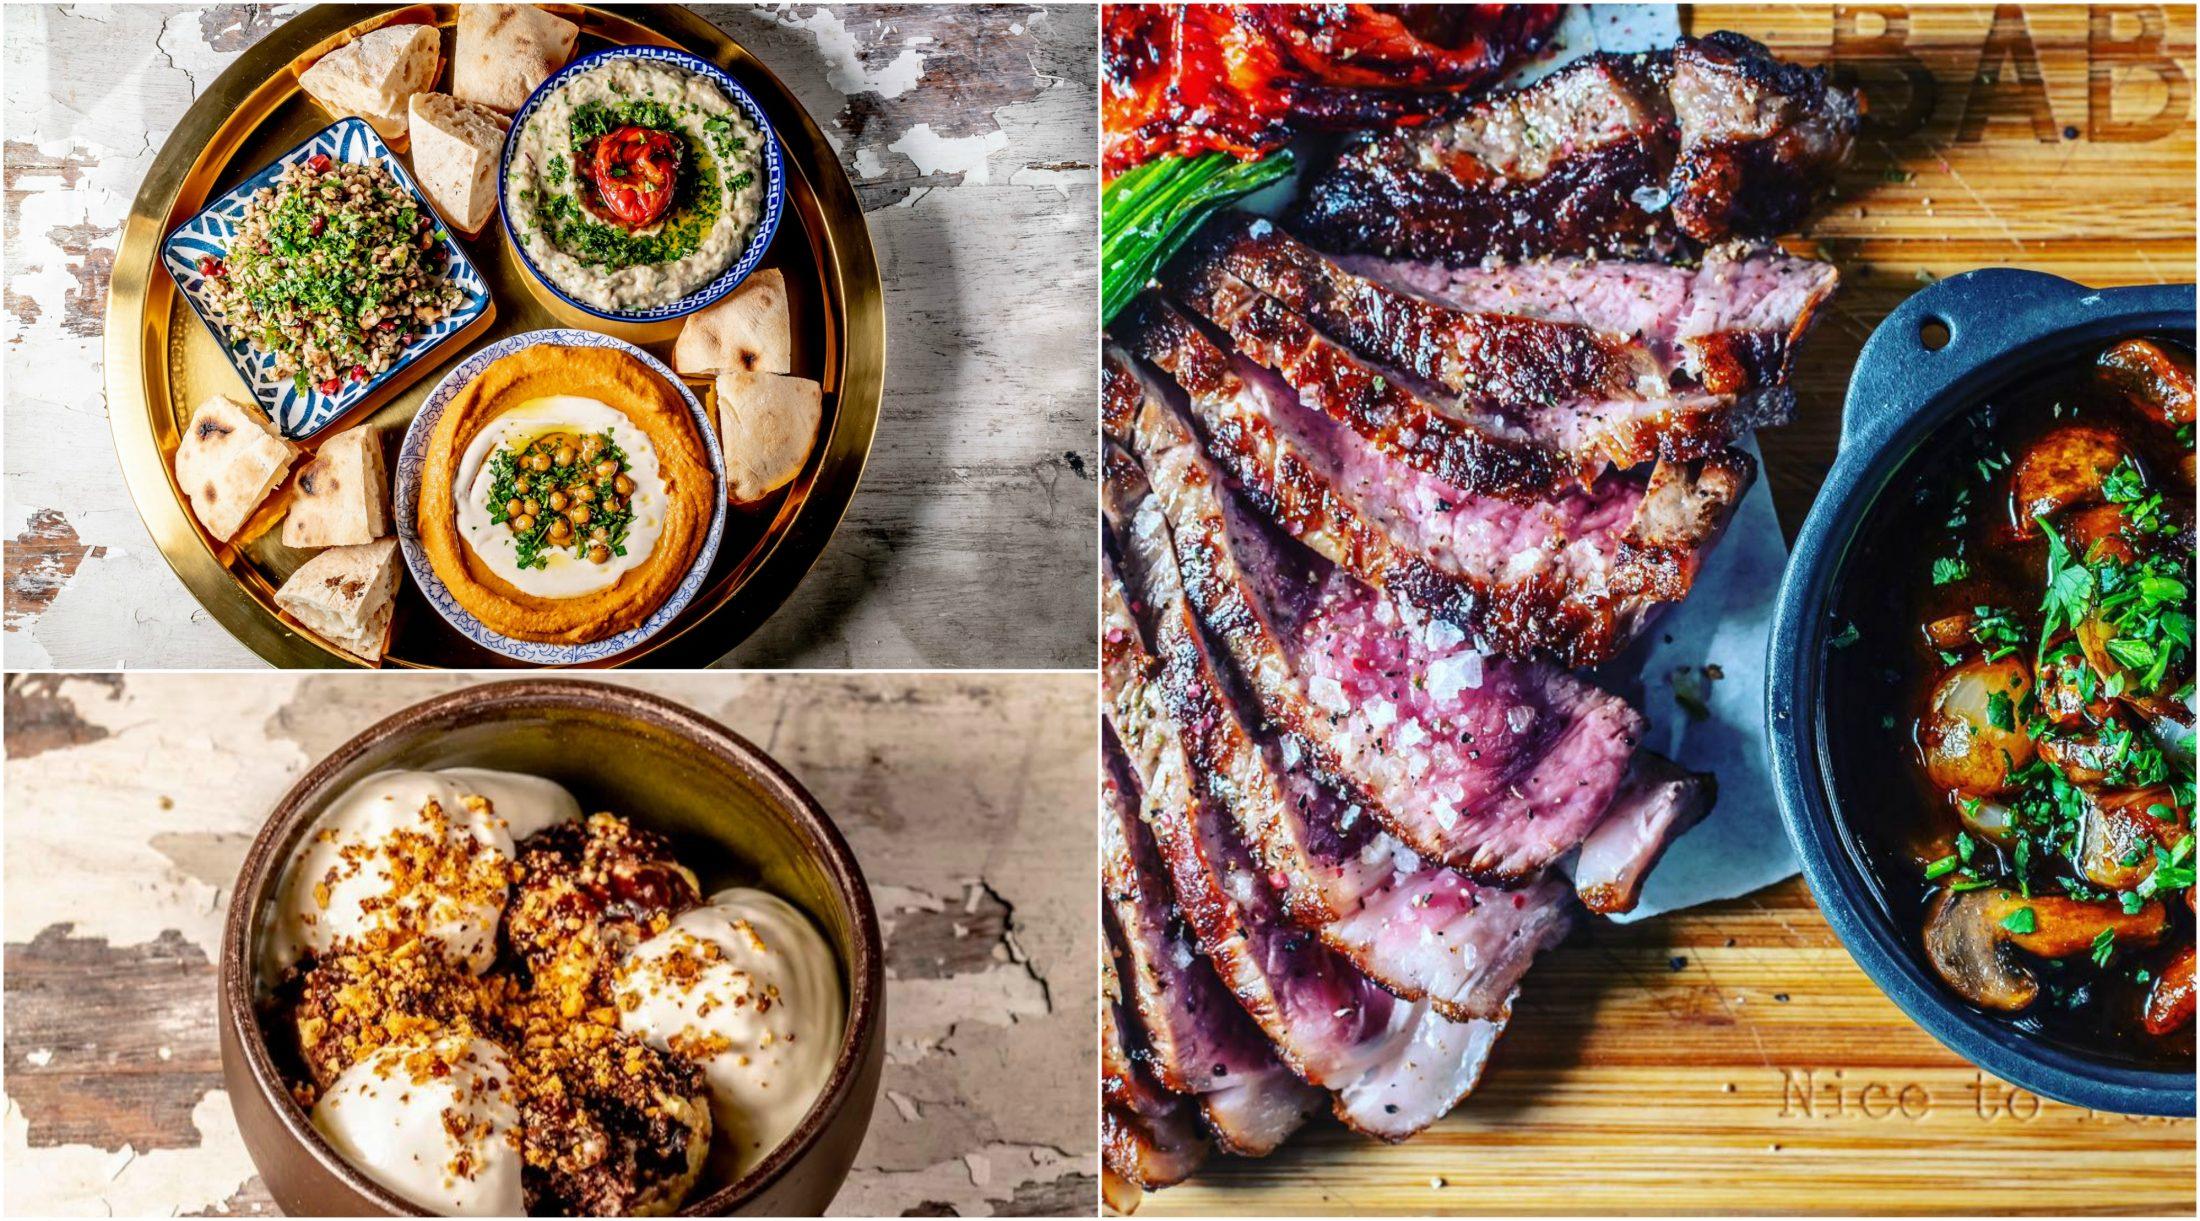 Egysaroknyi Tel-Aviv a Pozsonyi úton: Babka Budapest - Dining Guide